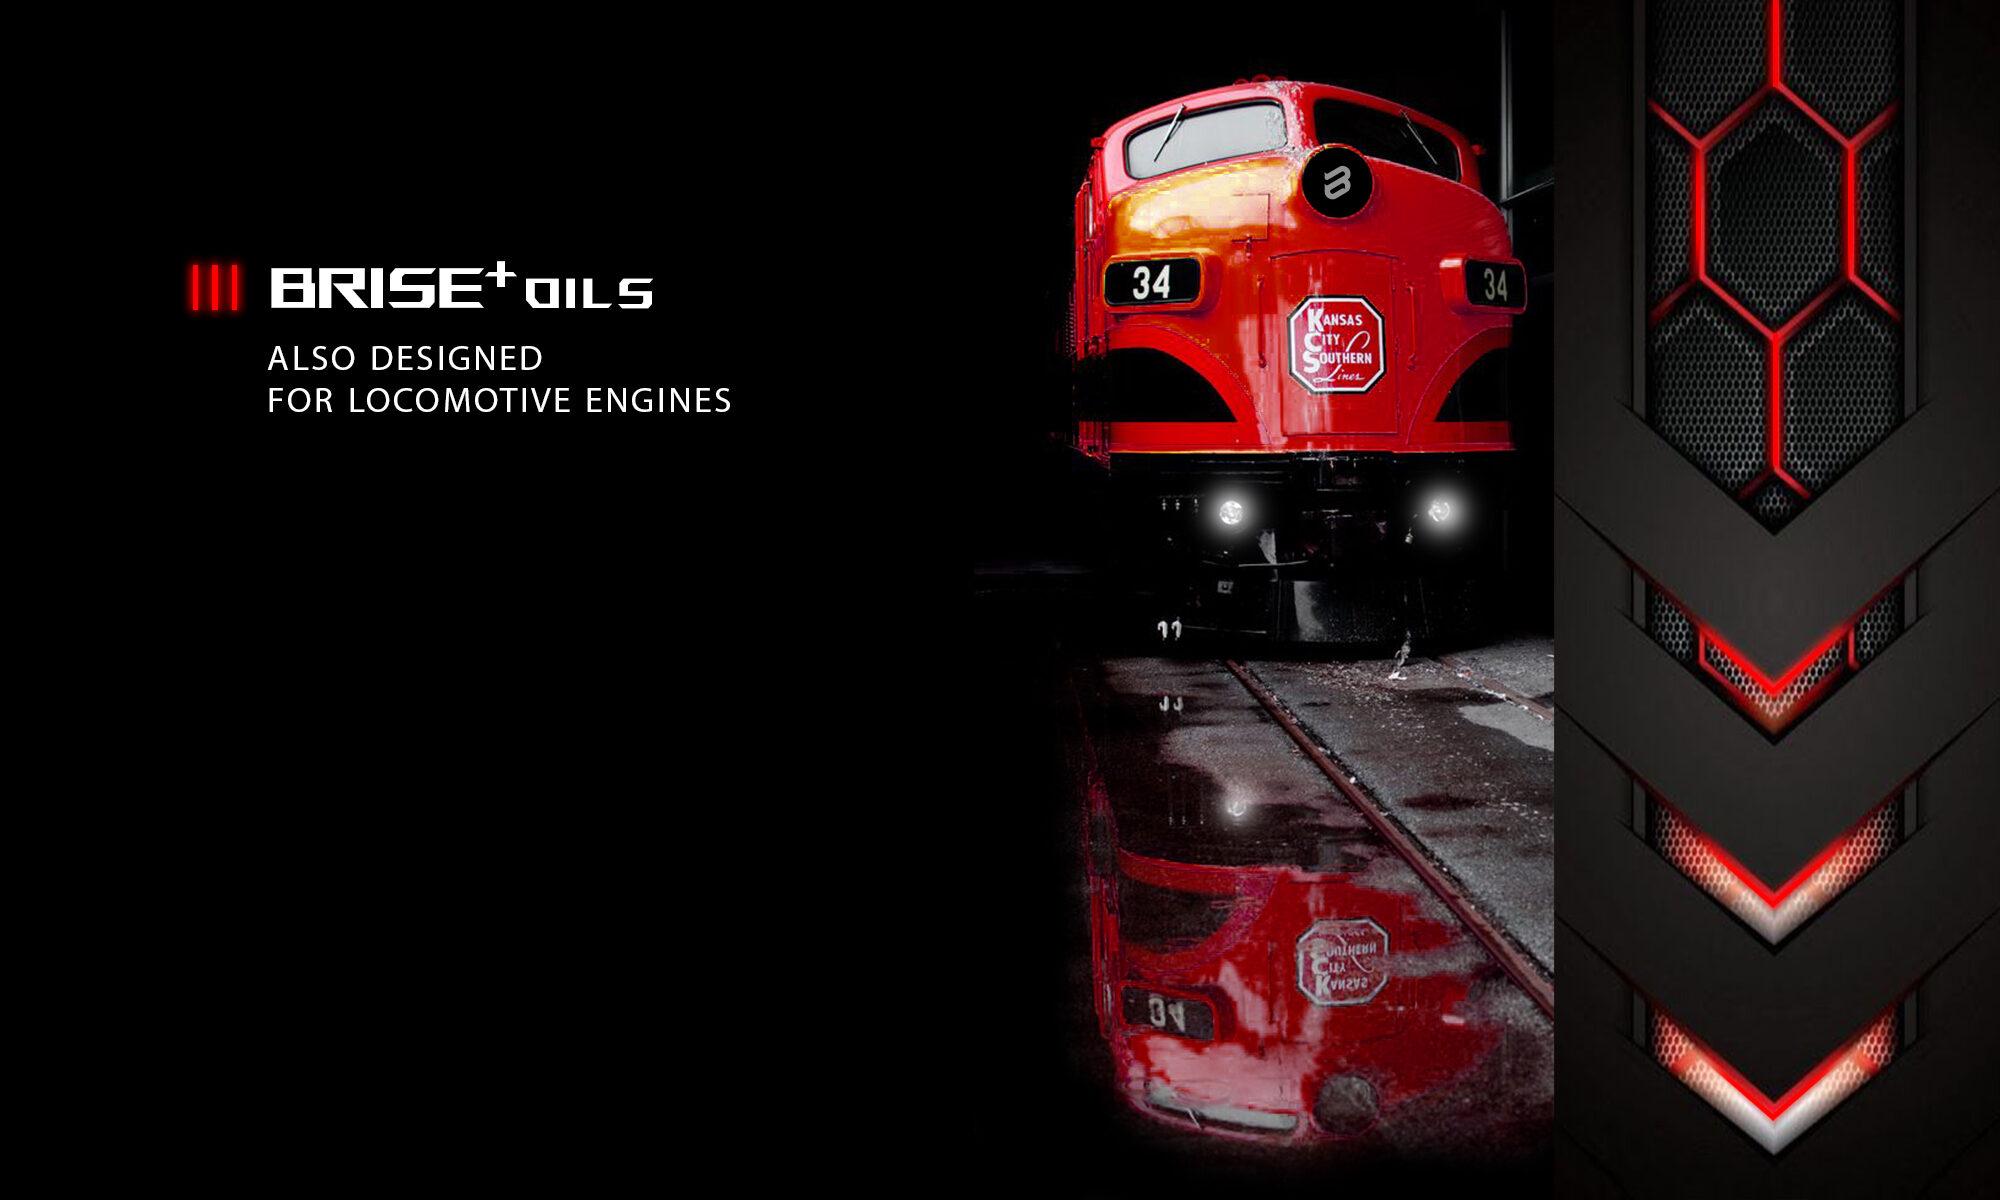 RED LOCOMOTIVE ON BLACK RAIL WHICH USE BRISE PLUS ENGINE OIL